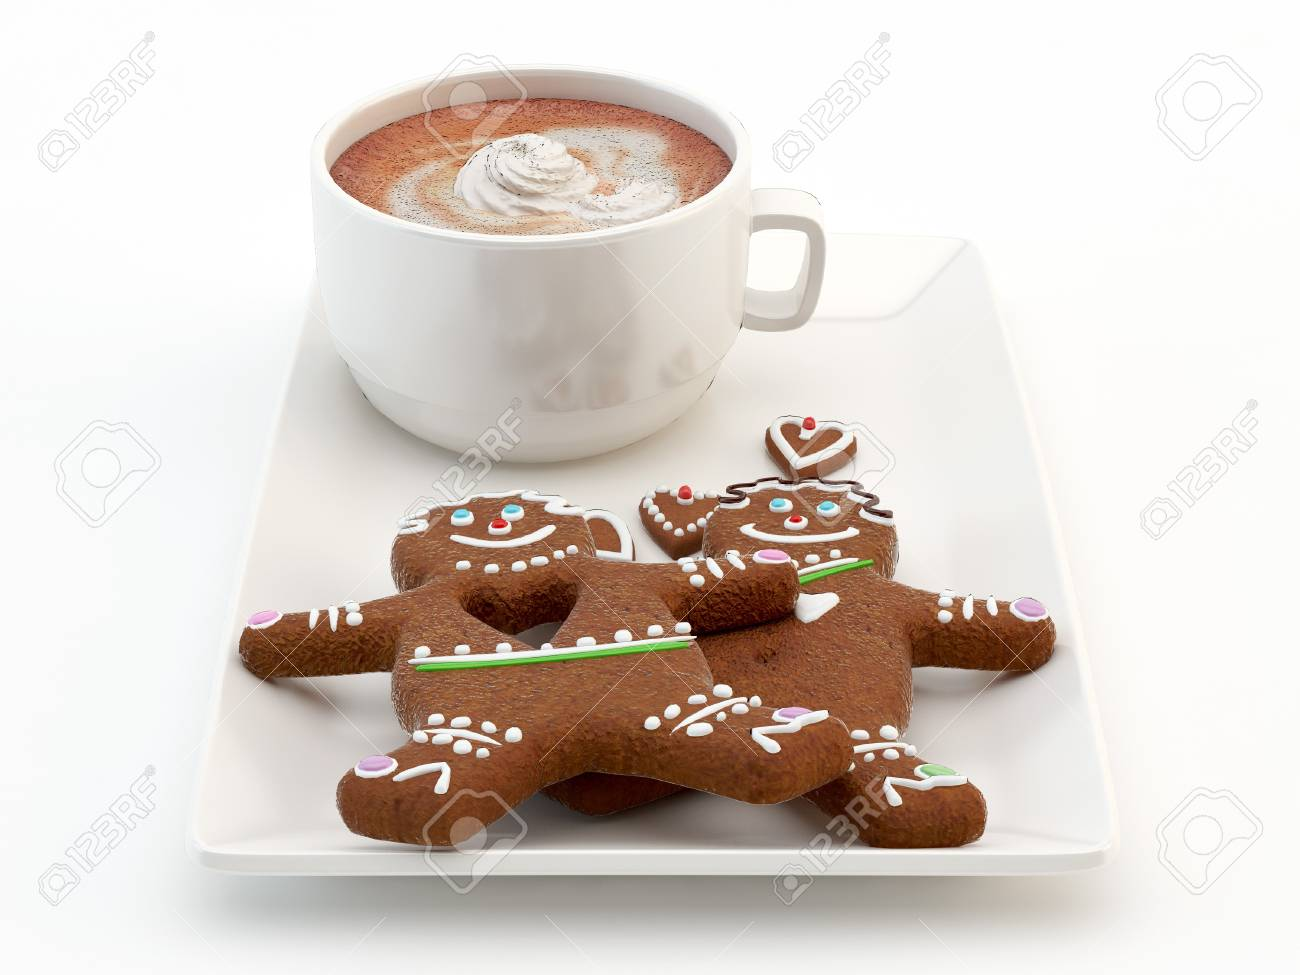 Coffee and chocolate cake Stock Photo - 14584699